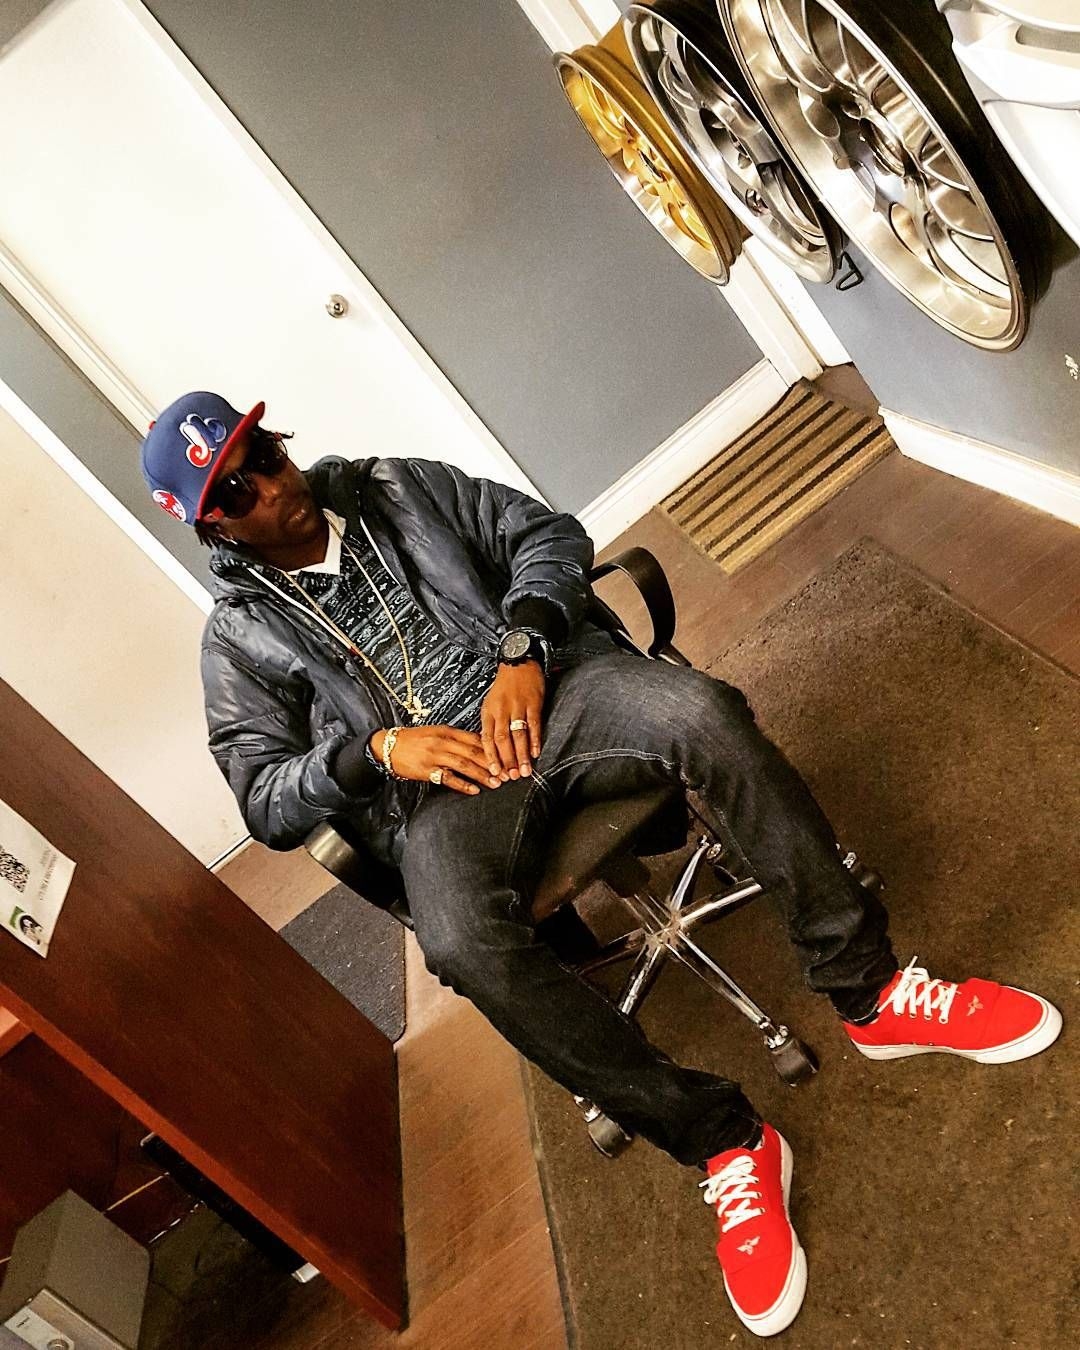 Who am I BADNUHBUMBO  artista bebble ting  badnuhbumbo  mixtape new track   OSAMA chex it peeps dem a Sey it crazy every lane every corner … a2226b45c3